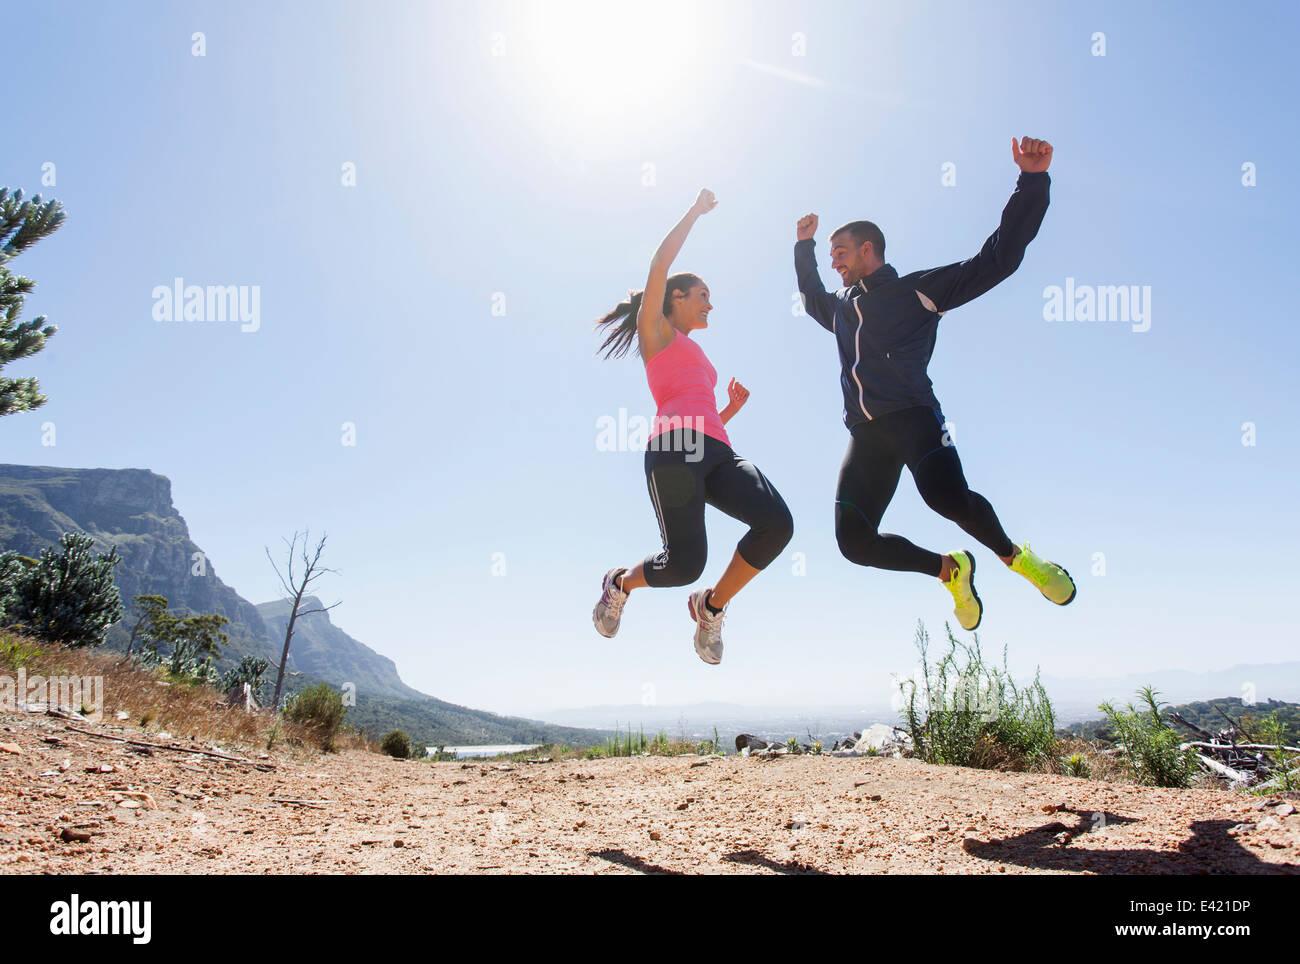 Junge Jogger springen in der Luft Stockbild